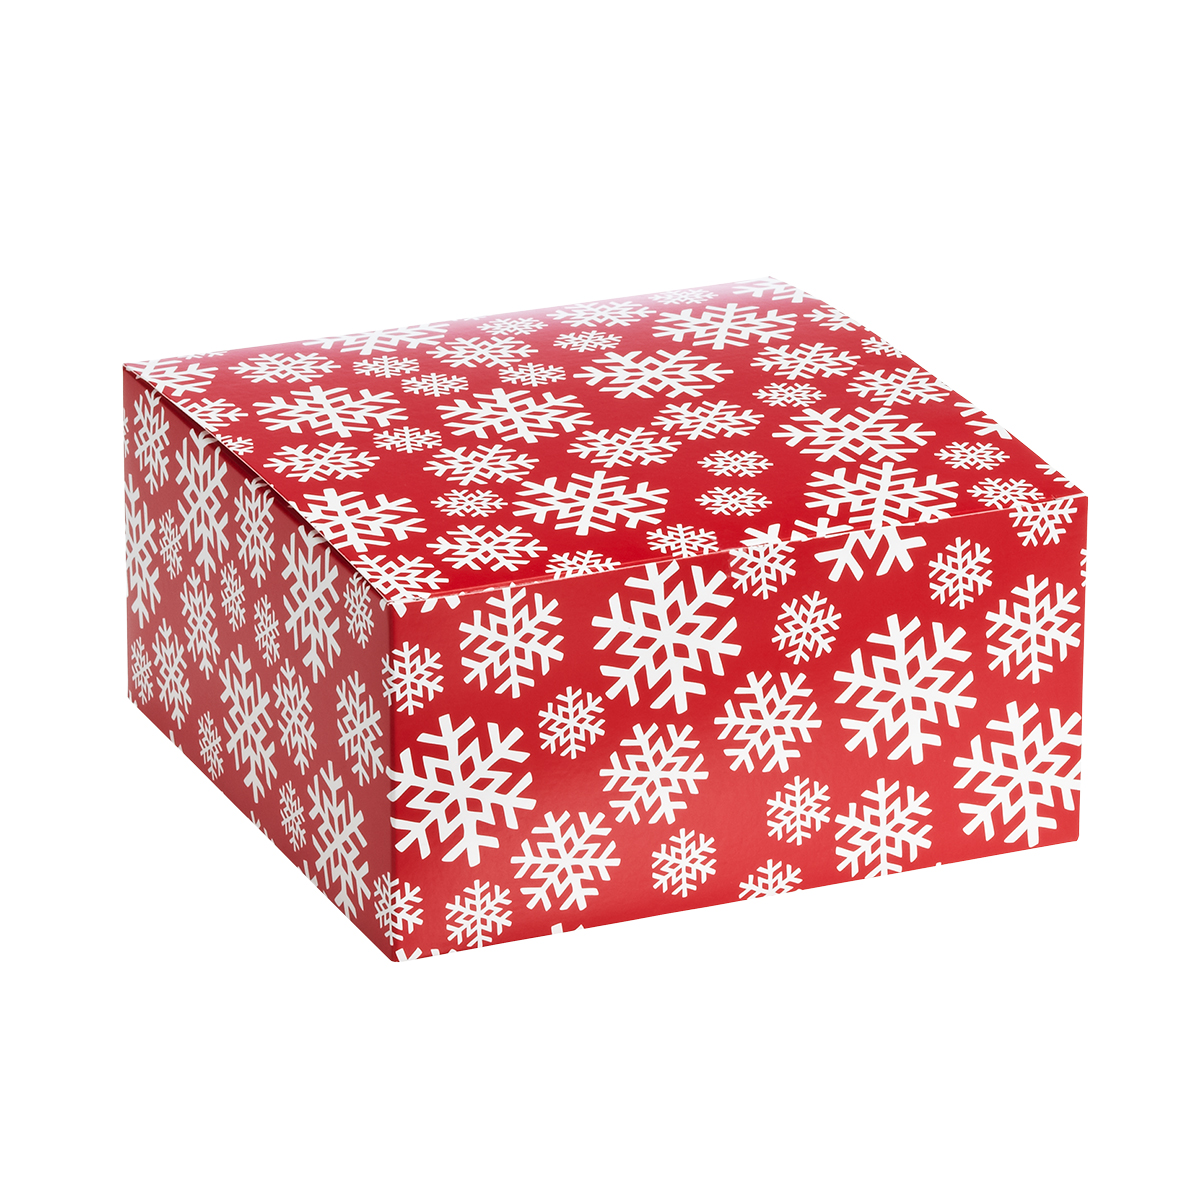 1-pc. Gift Box Stripes